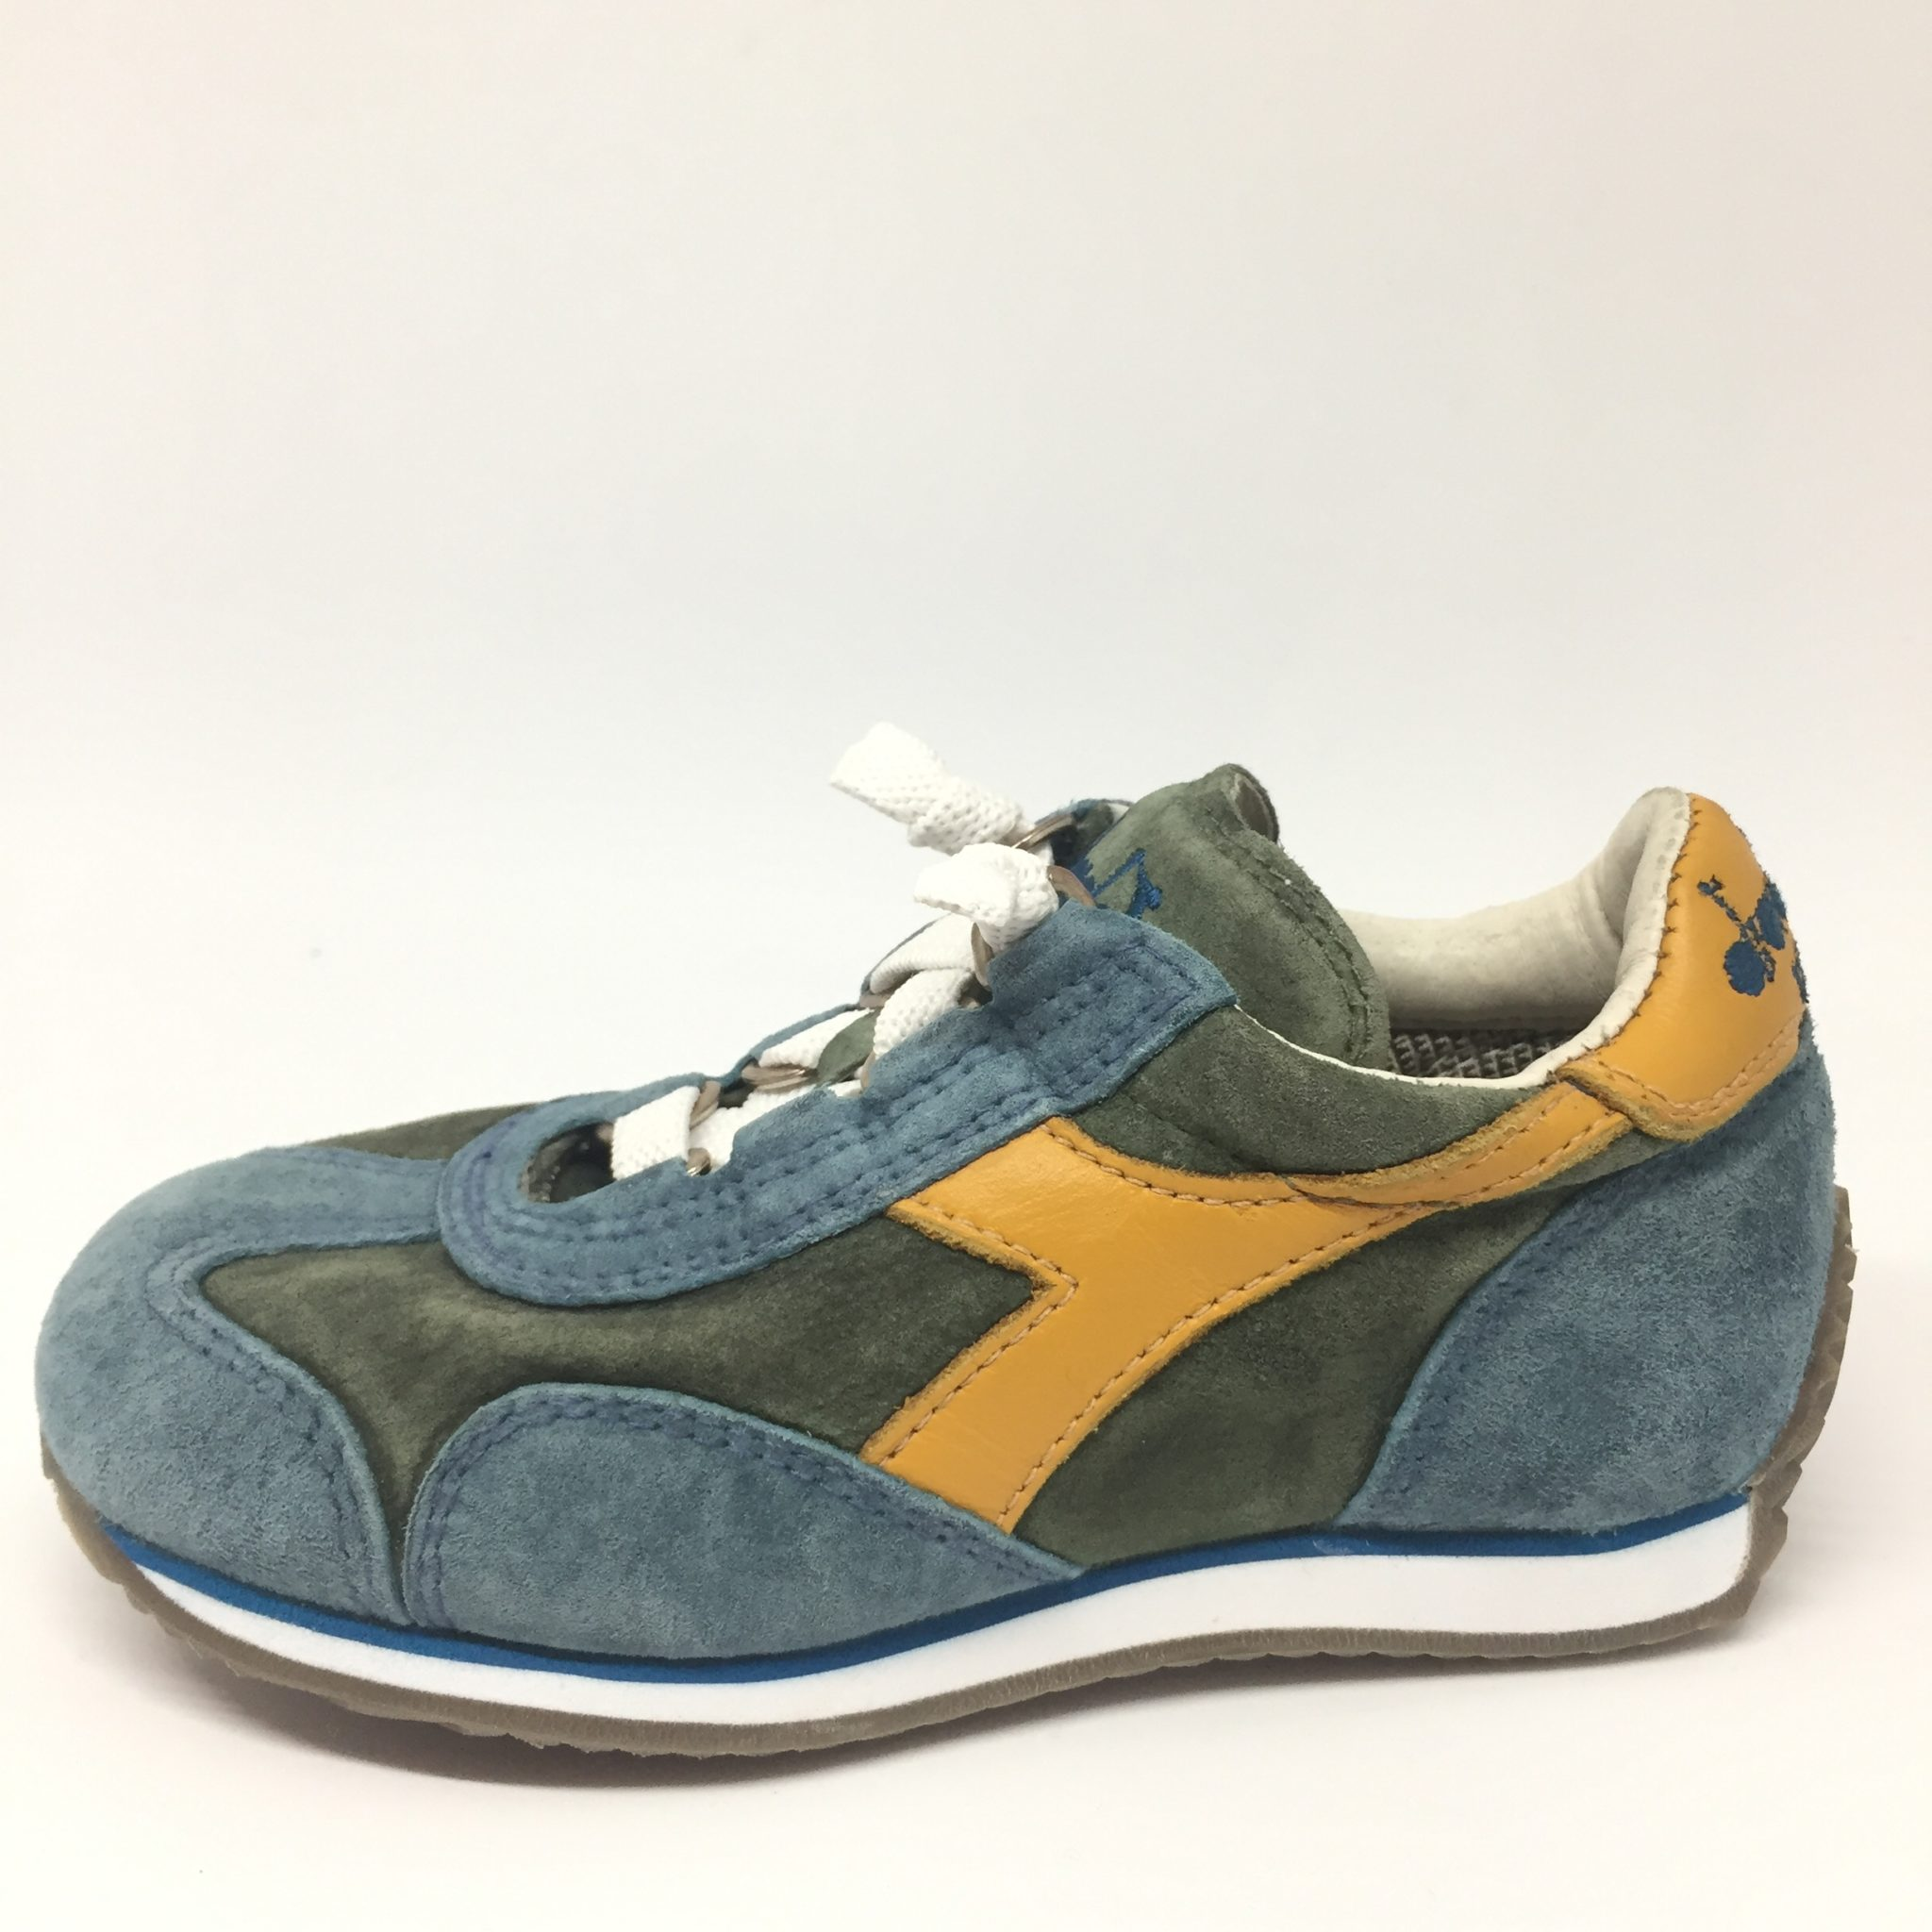 a3c9c4fc6507 Diadora Heritage Equipe S SW JR – La Griffe calzature